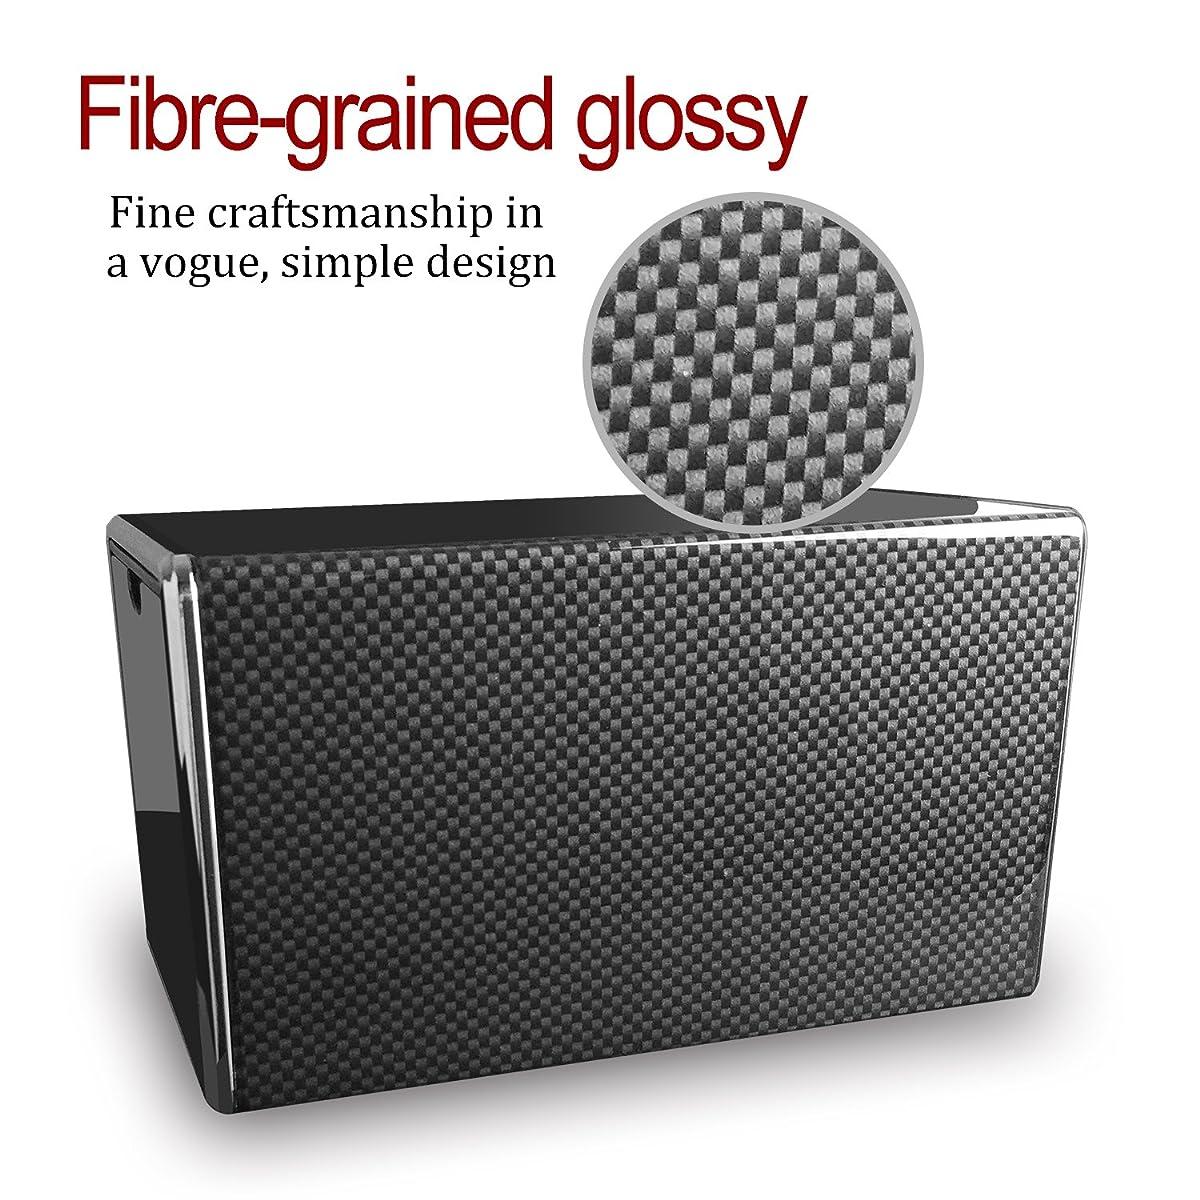 POUILLA Carbon Fibre Piano Finish Automatic Single Watch Winder Glossy SG0178